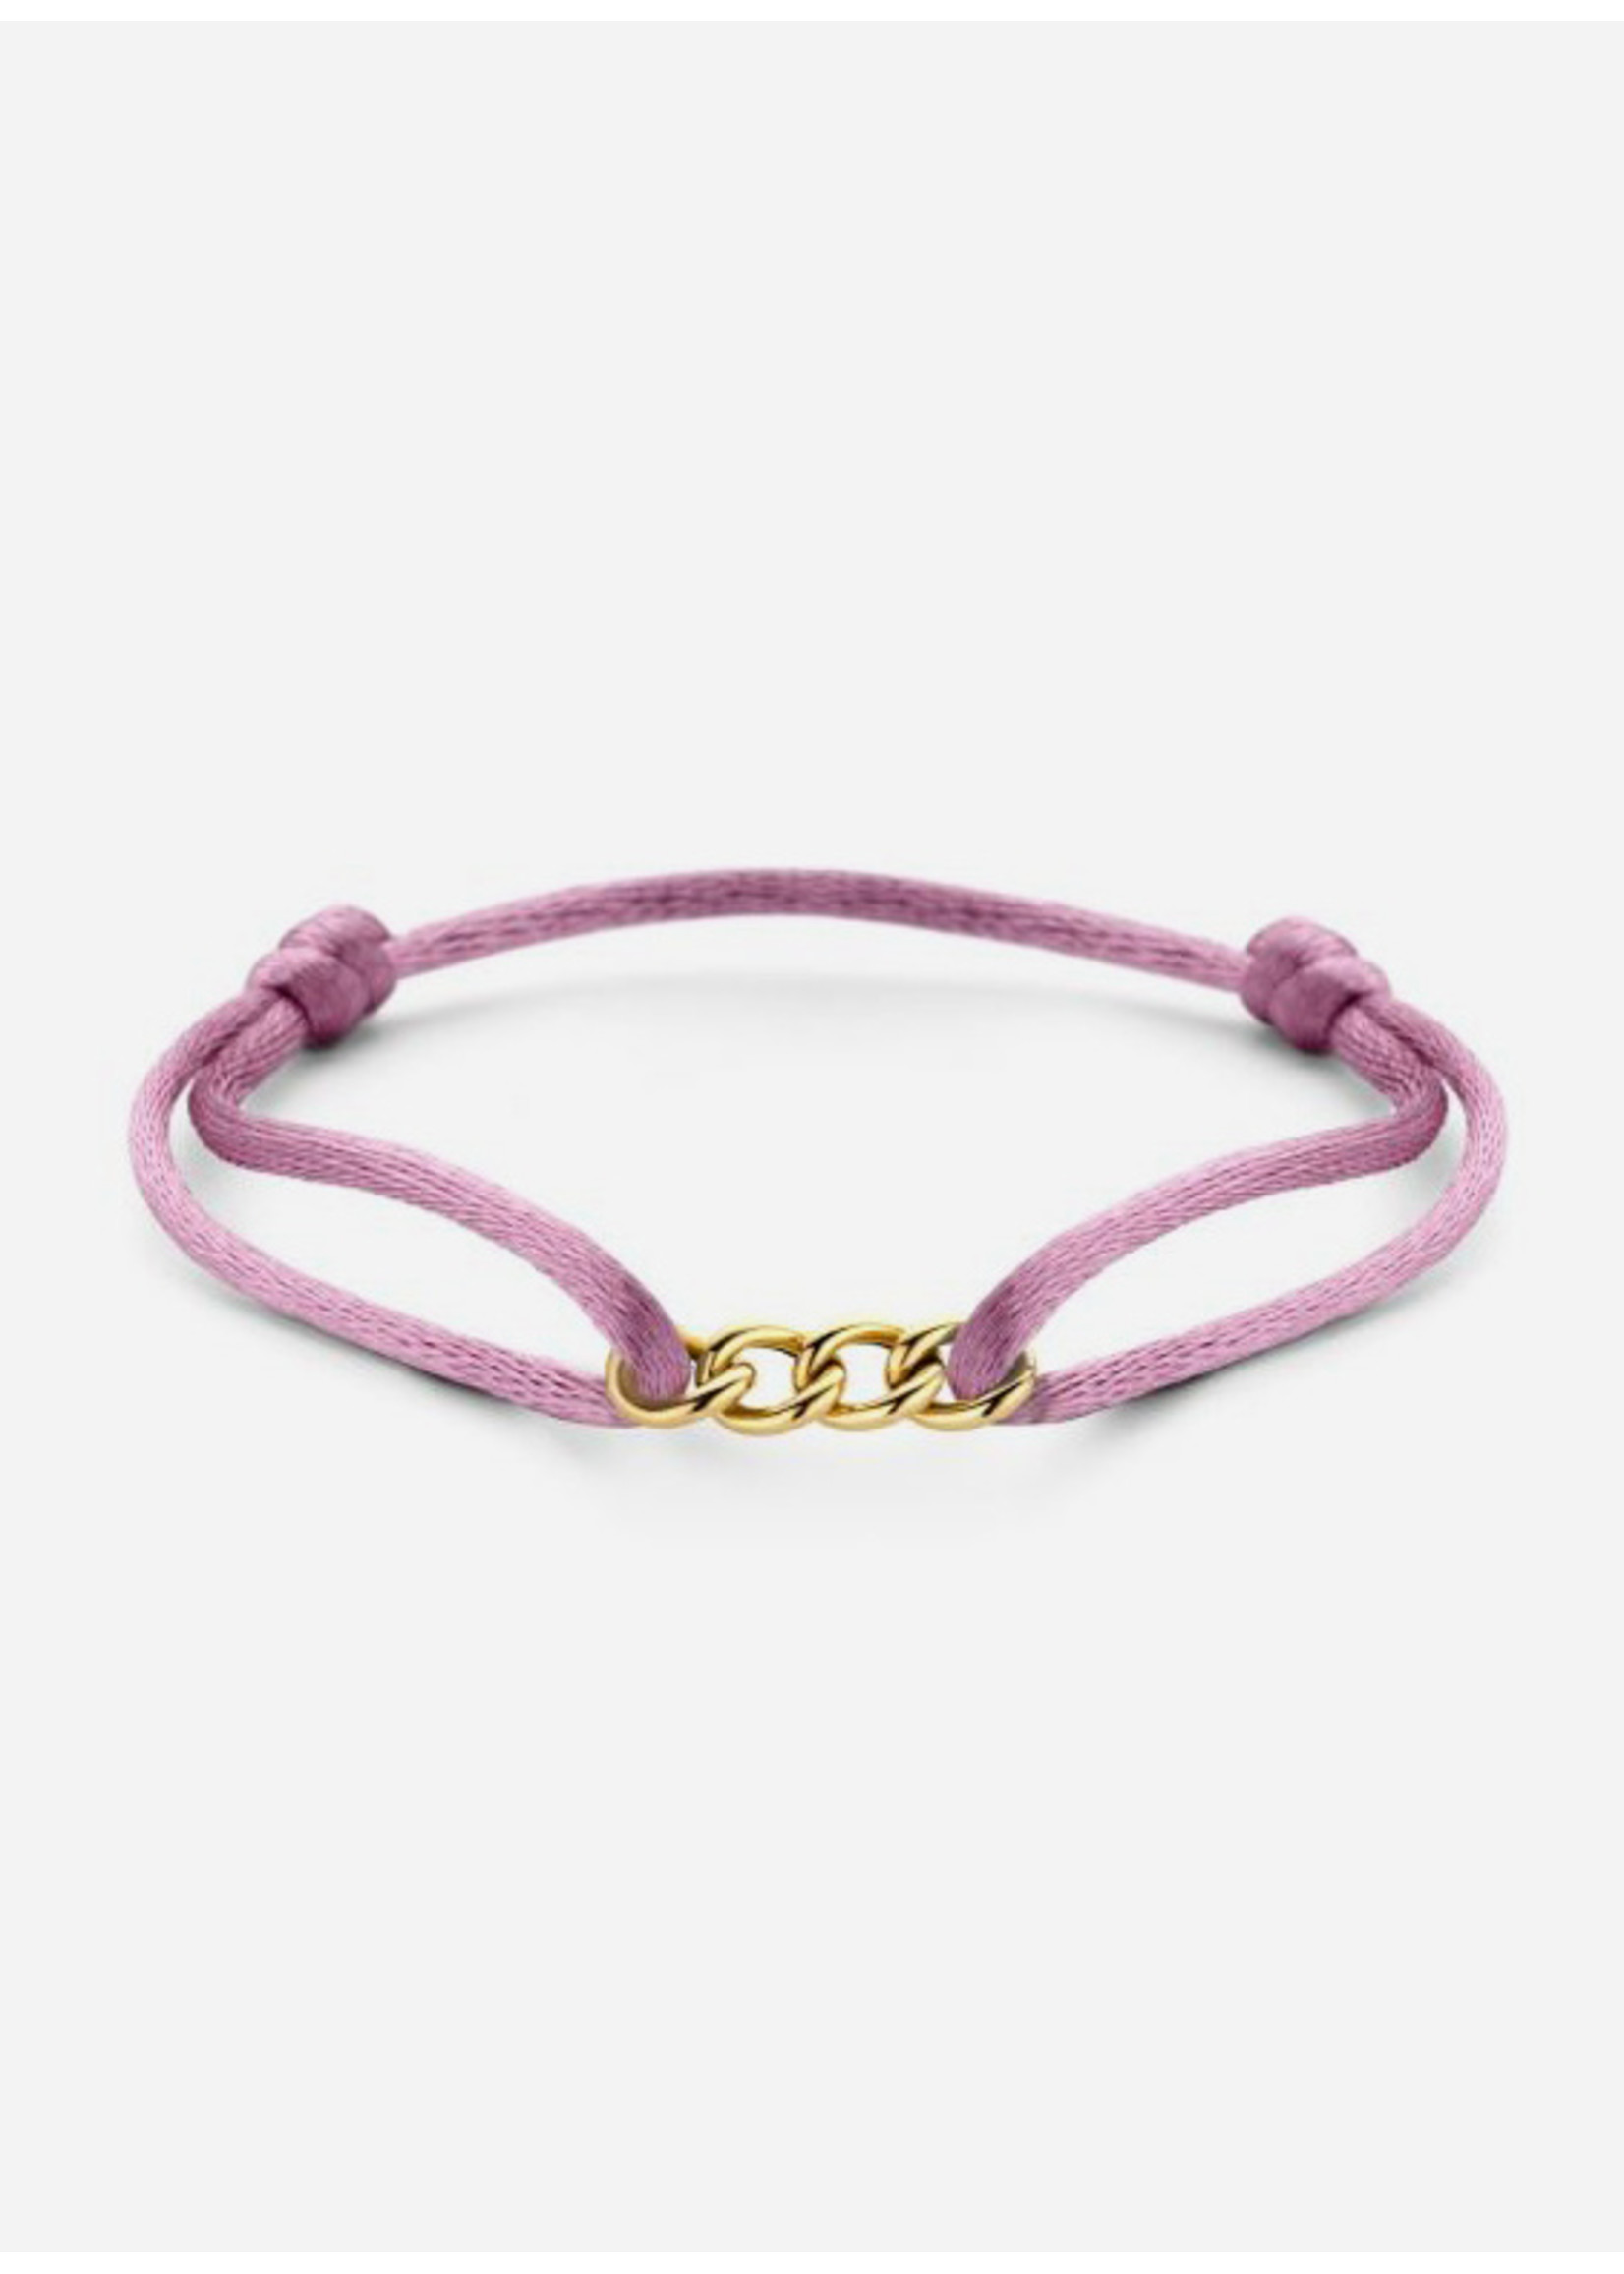 Just Franky Chain bracelet silk